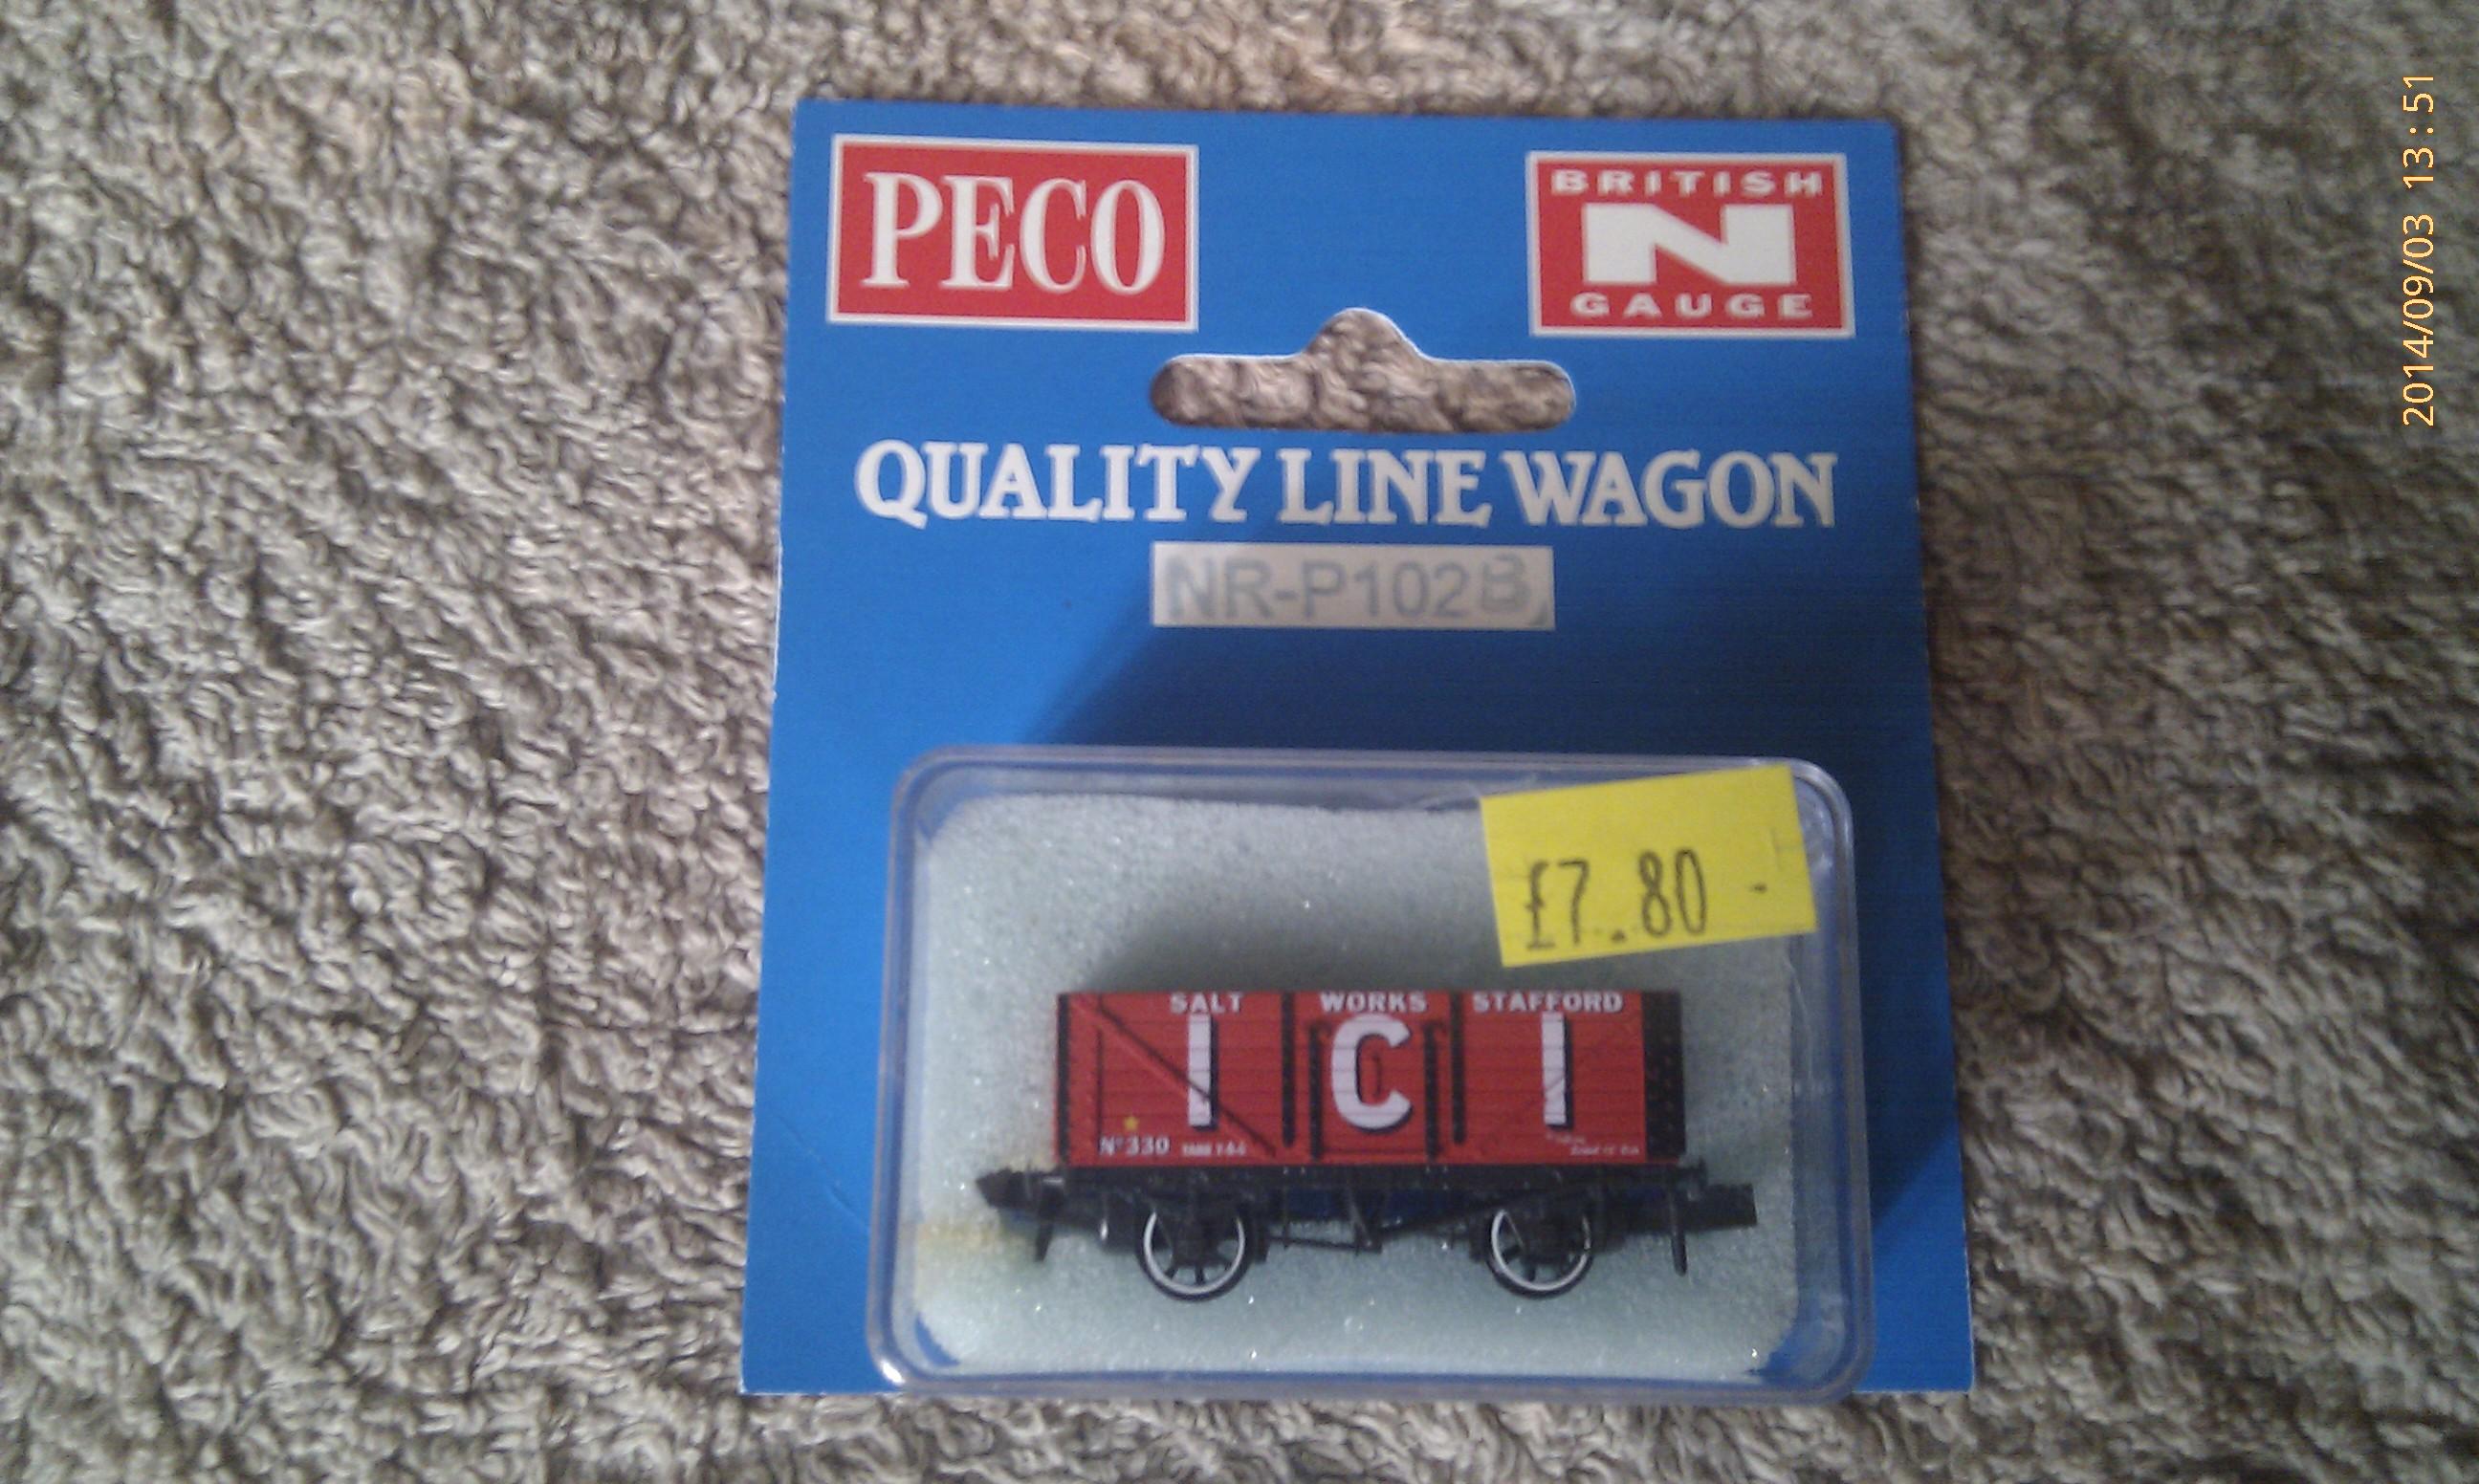 Peco Quality Line Wagon NR-P102B ICI